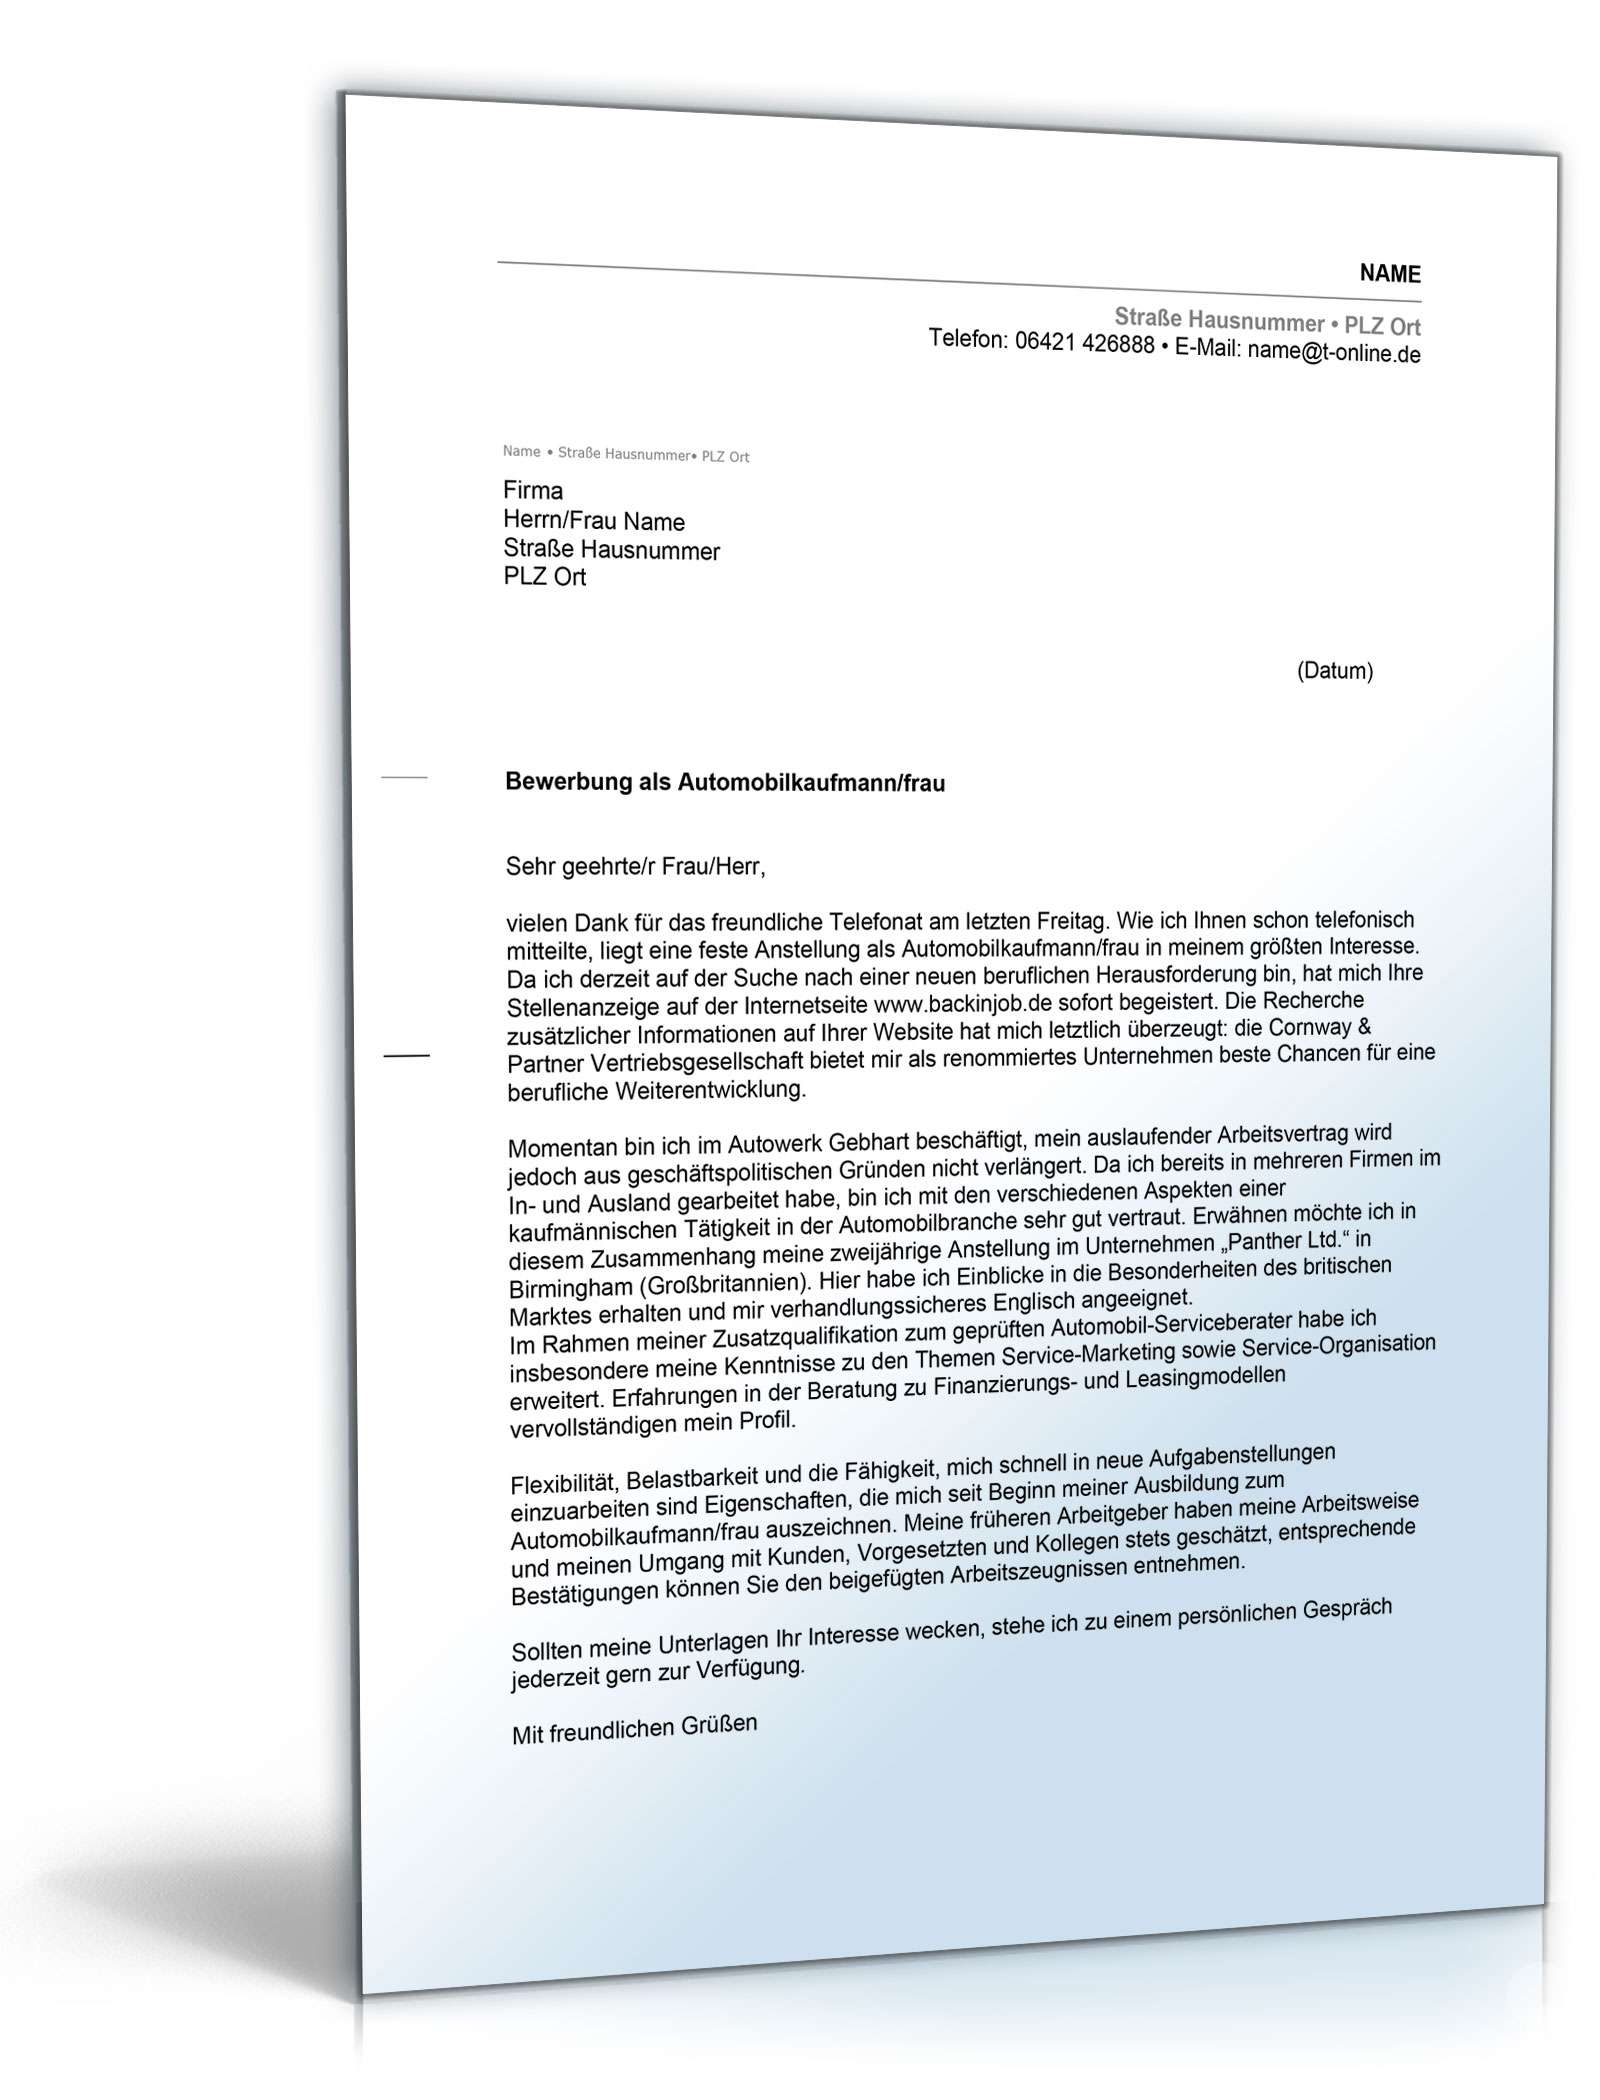 Anschreiben Bewerbung Automobilkaufmann Muster Zum Download